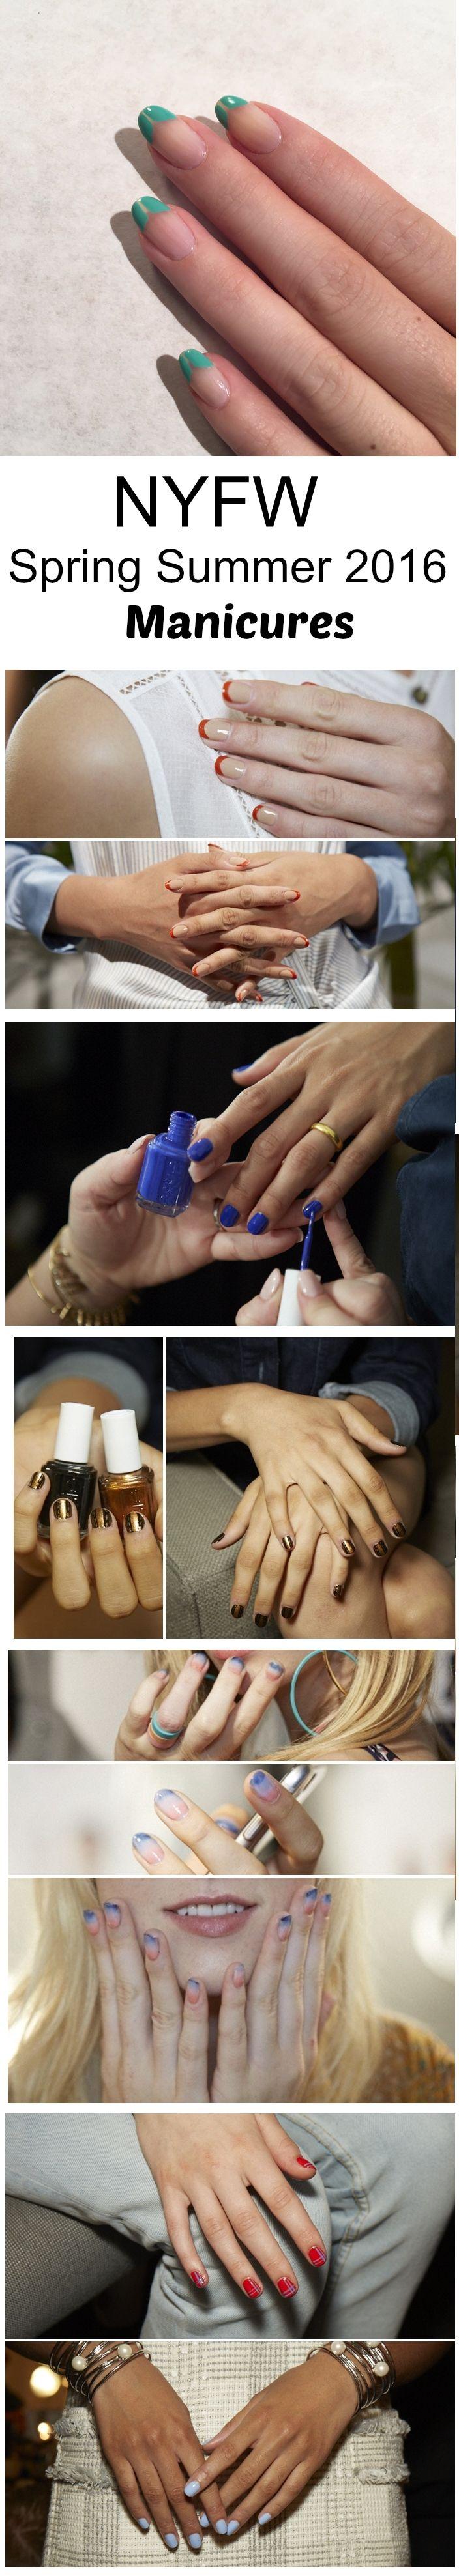 foto de NYFW Spring summer 2016 Manicures Magnificent Manicures